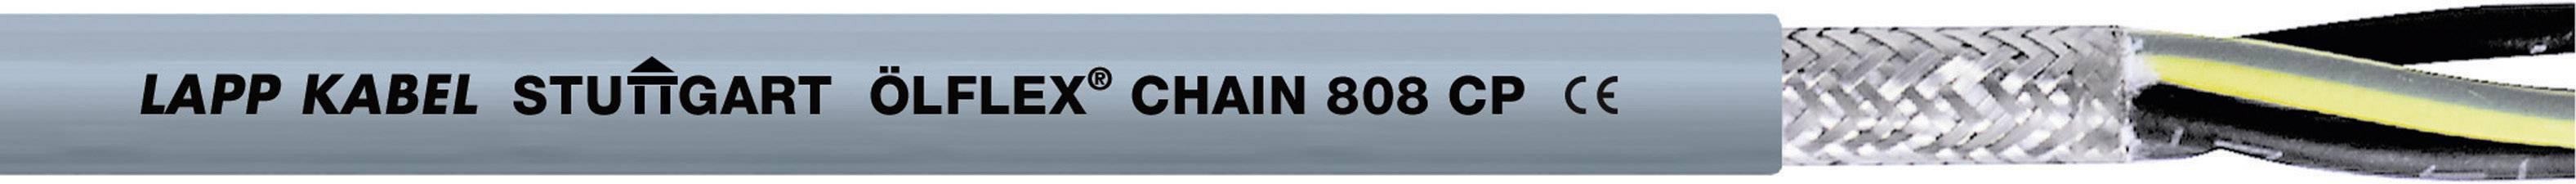 Žíla kabelu LappKabel ÖLFLEX CHAIN 808 CP 12G0,5 (1027756), 12x 0,5 mm², polyurethan, Ø 10 mm, stíněný, 100 m,